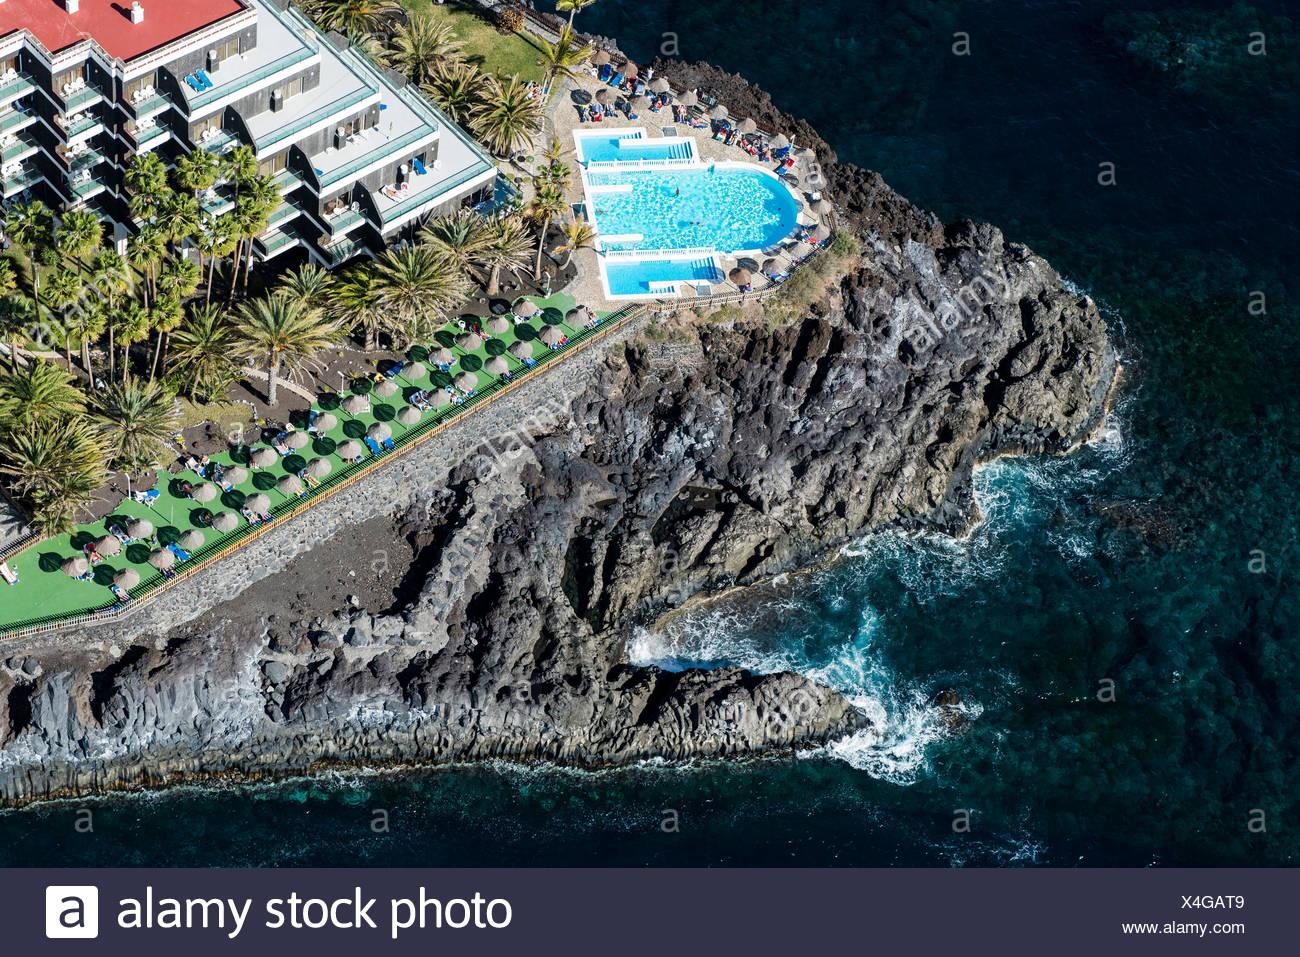 Pool hotel sol puerto de naos atlantikk ste vulkan k ste luftbild insel la palma kanaren - Hotel sol puerto naos ...